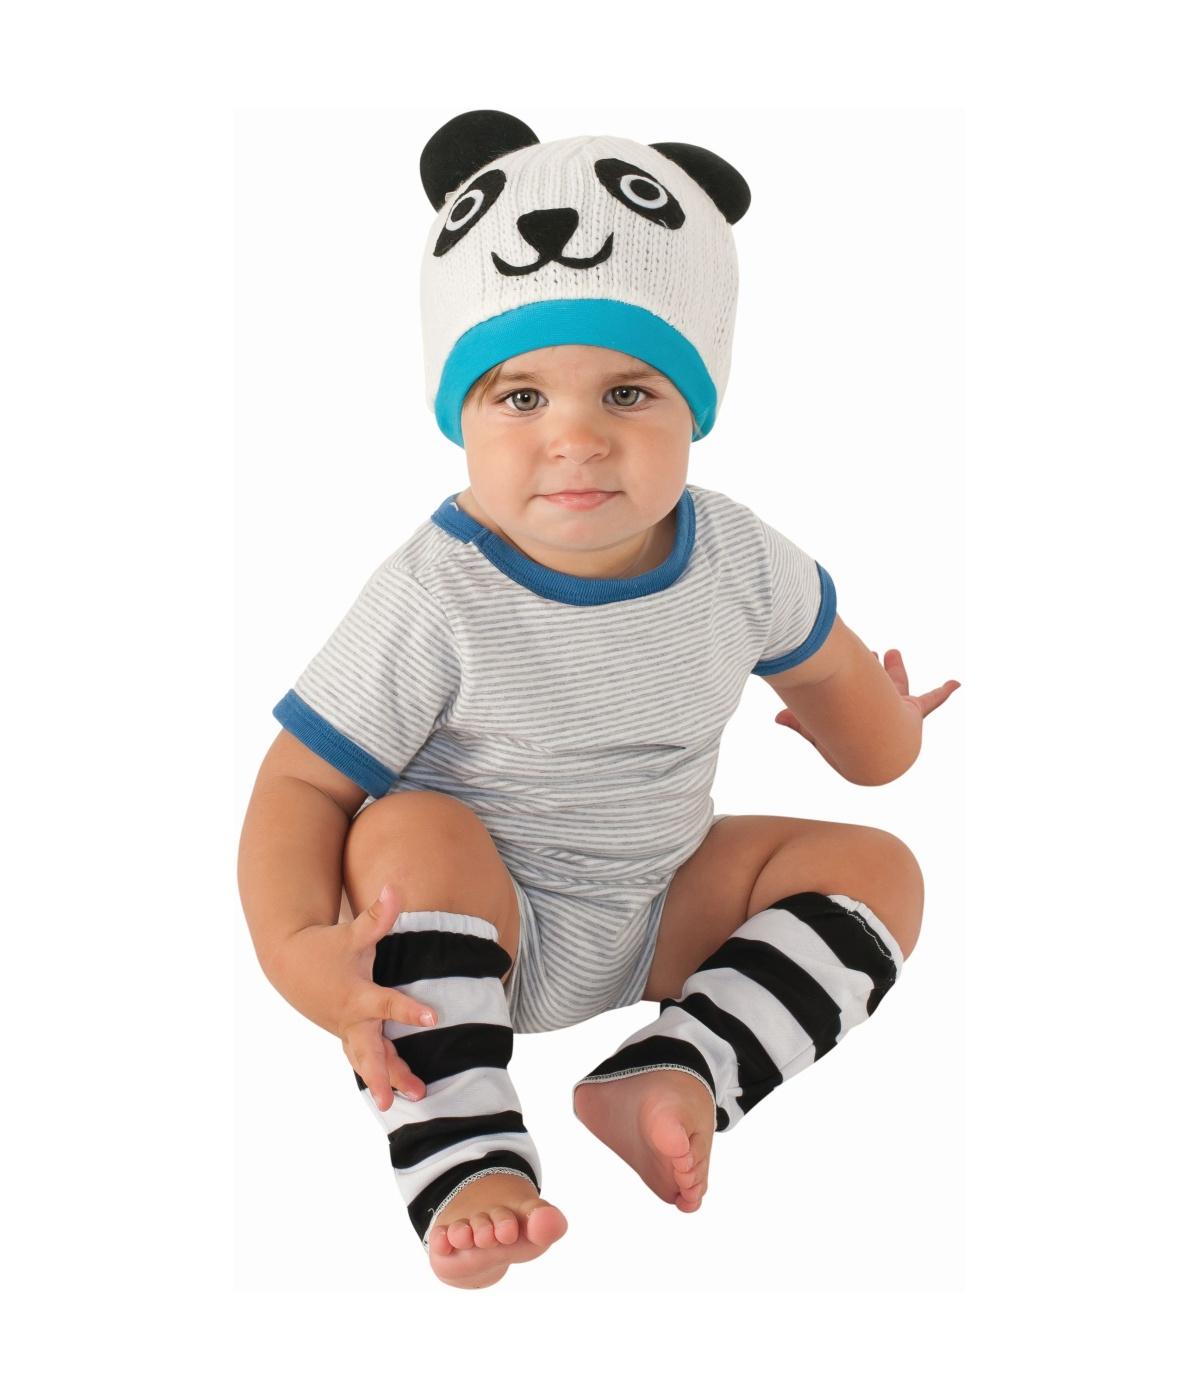 Sweet Little Panda Baby Costume  sc 1 st  Wonder Costumes & Sweet Little Panda Baby Costume - Animal Costumes